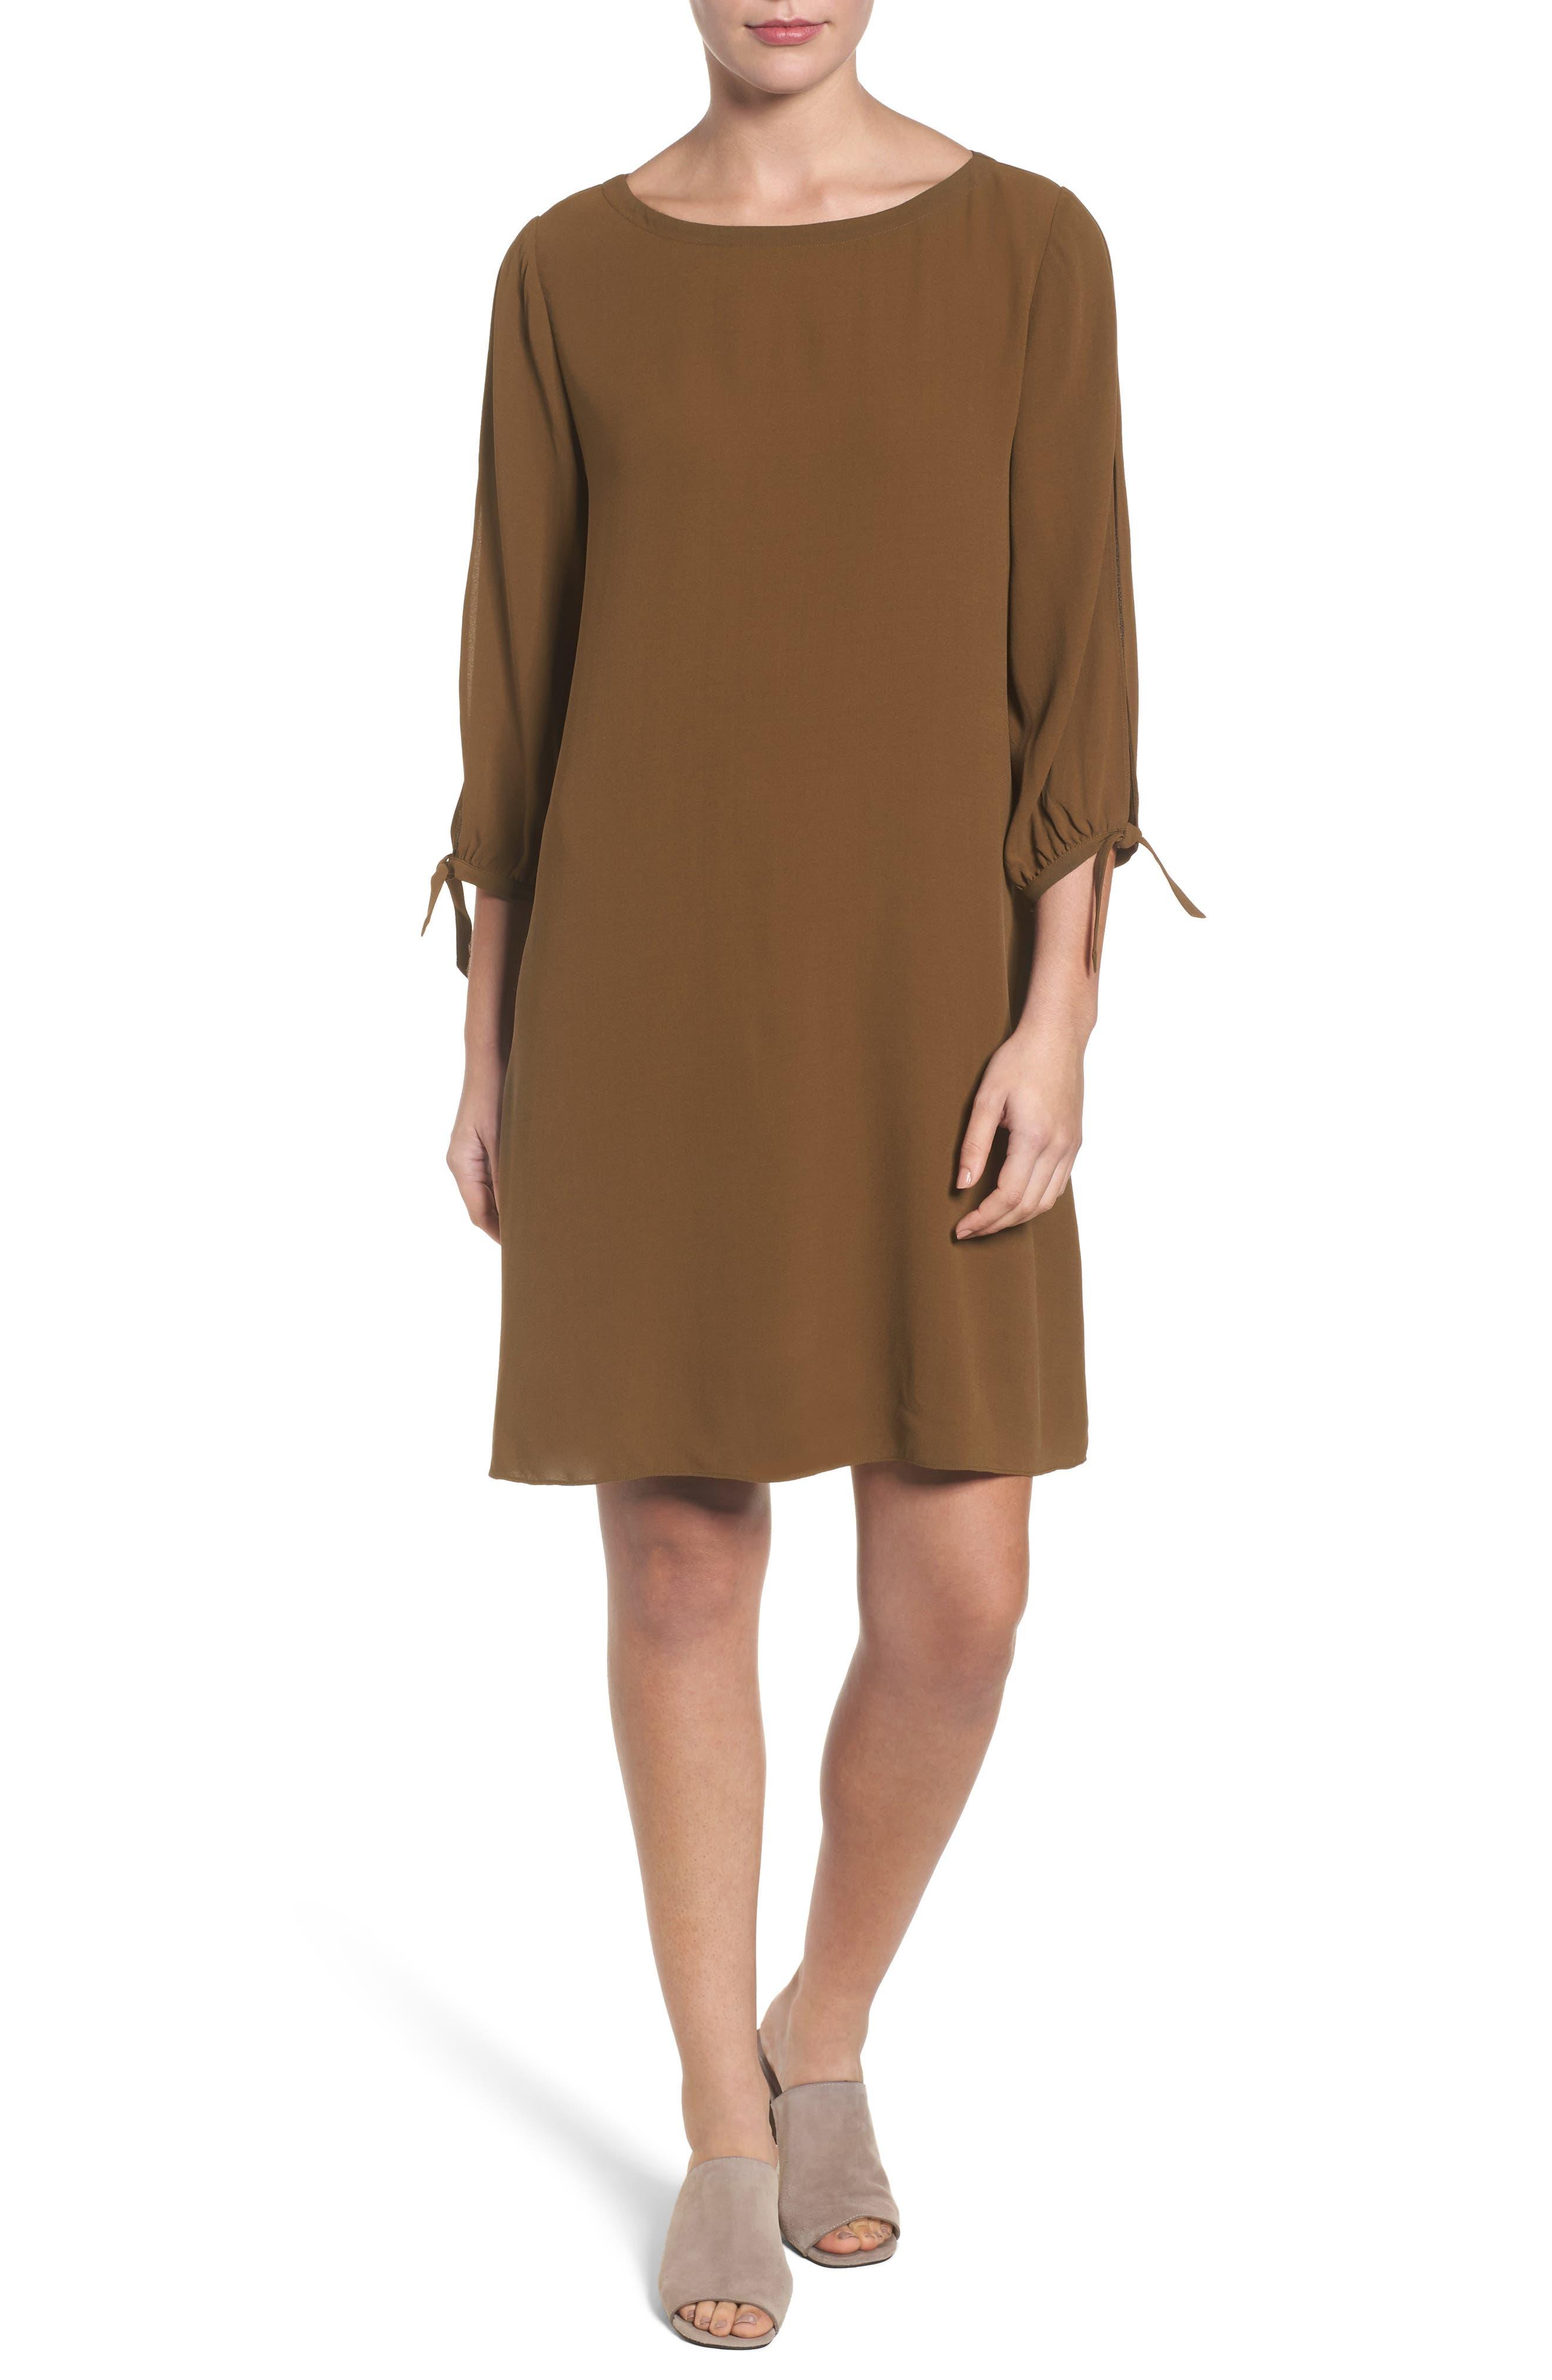 Alternate Image 1 Selected - Eileen Fisher Silk Shift Dress (Regular & Petite)